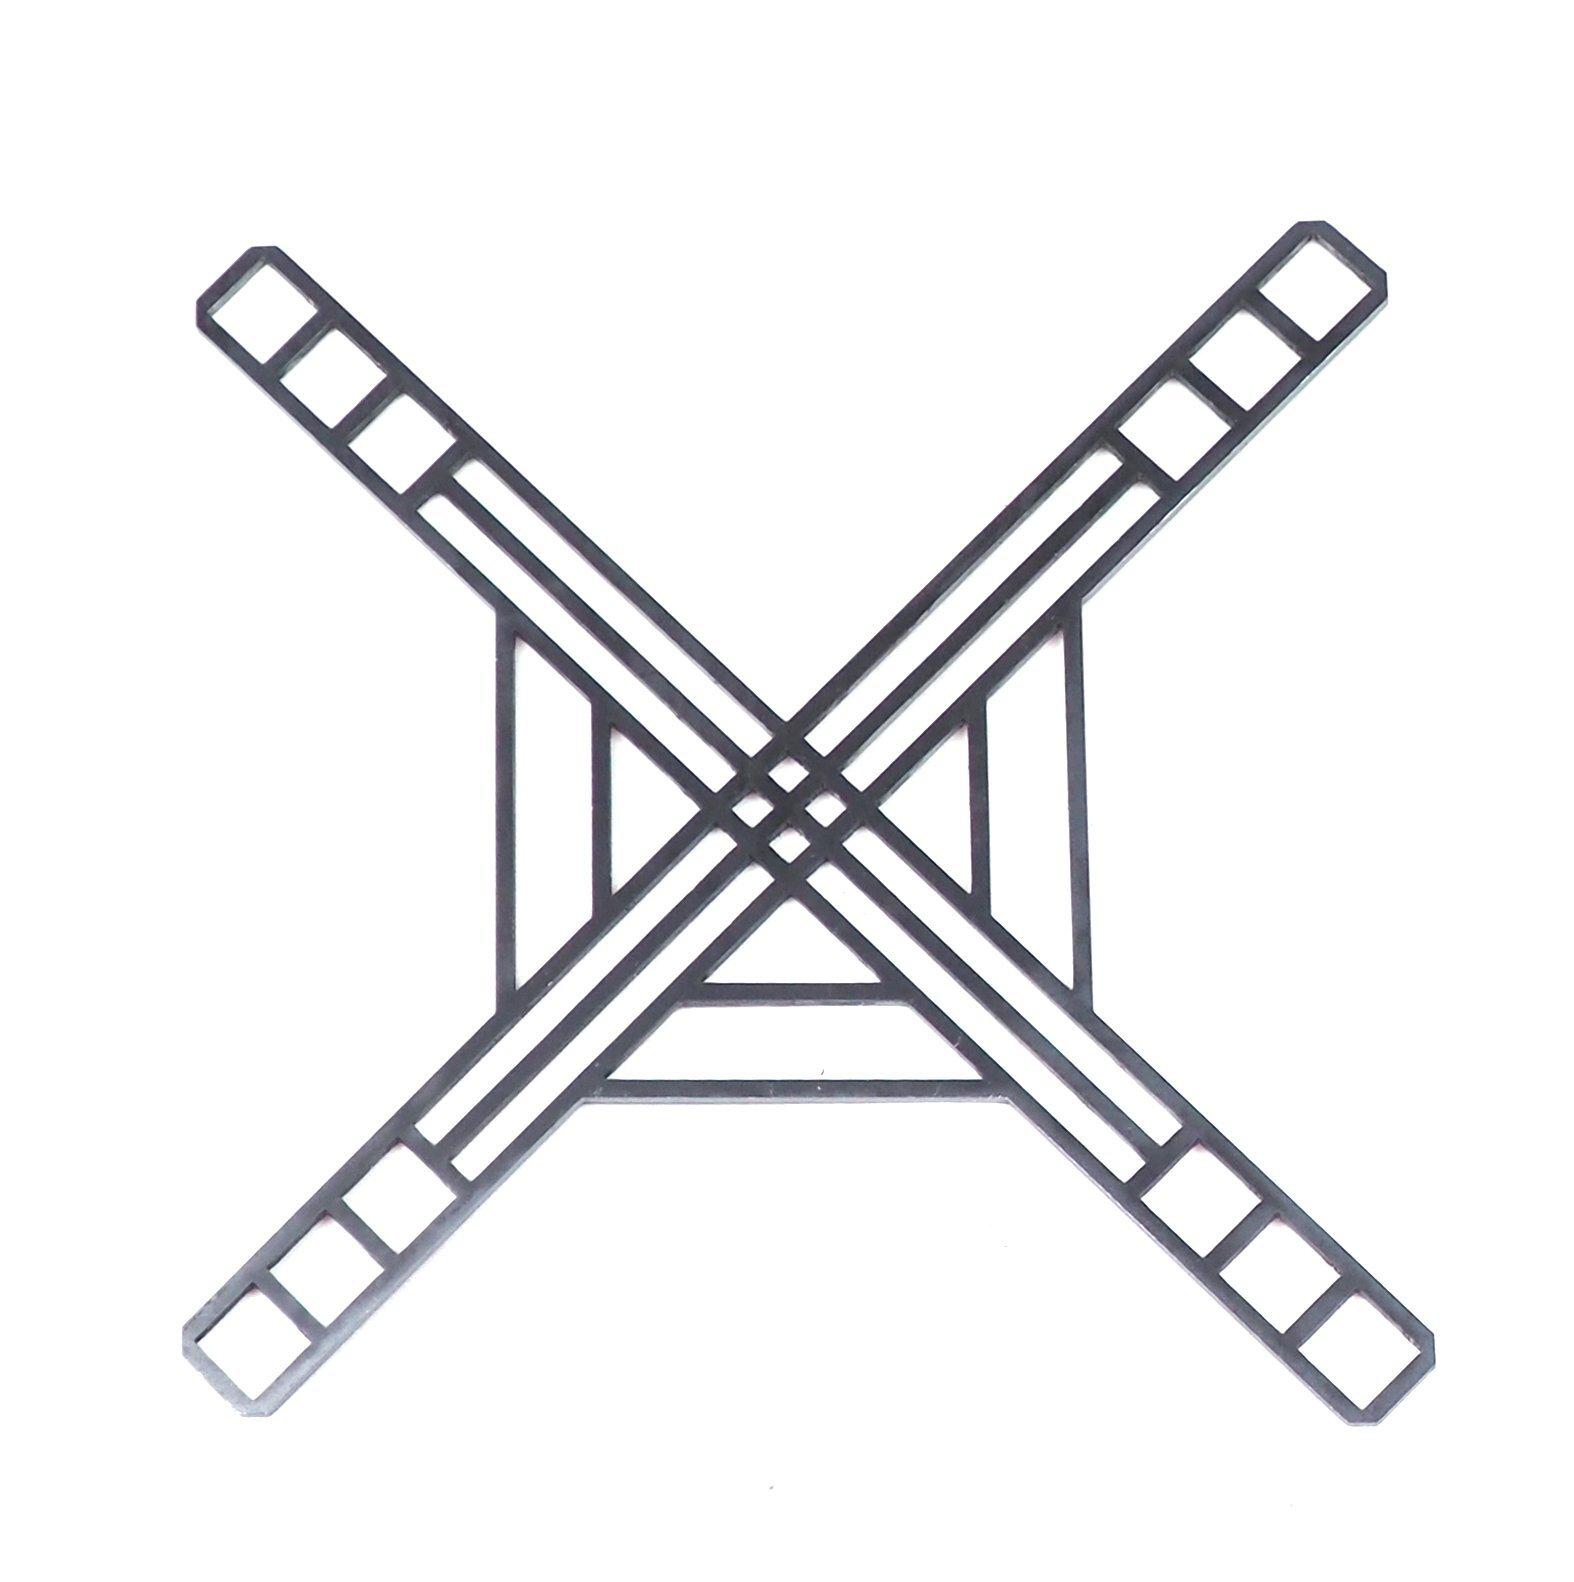 Top Table Square L トップテーブル スクエア Lサイズ / MITARI WORKS ミタリワークス